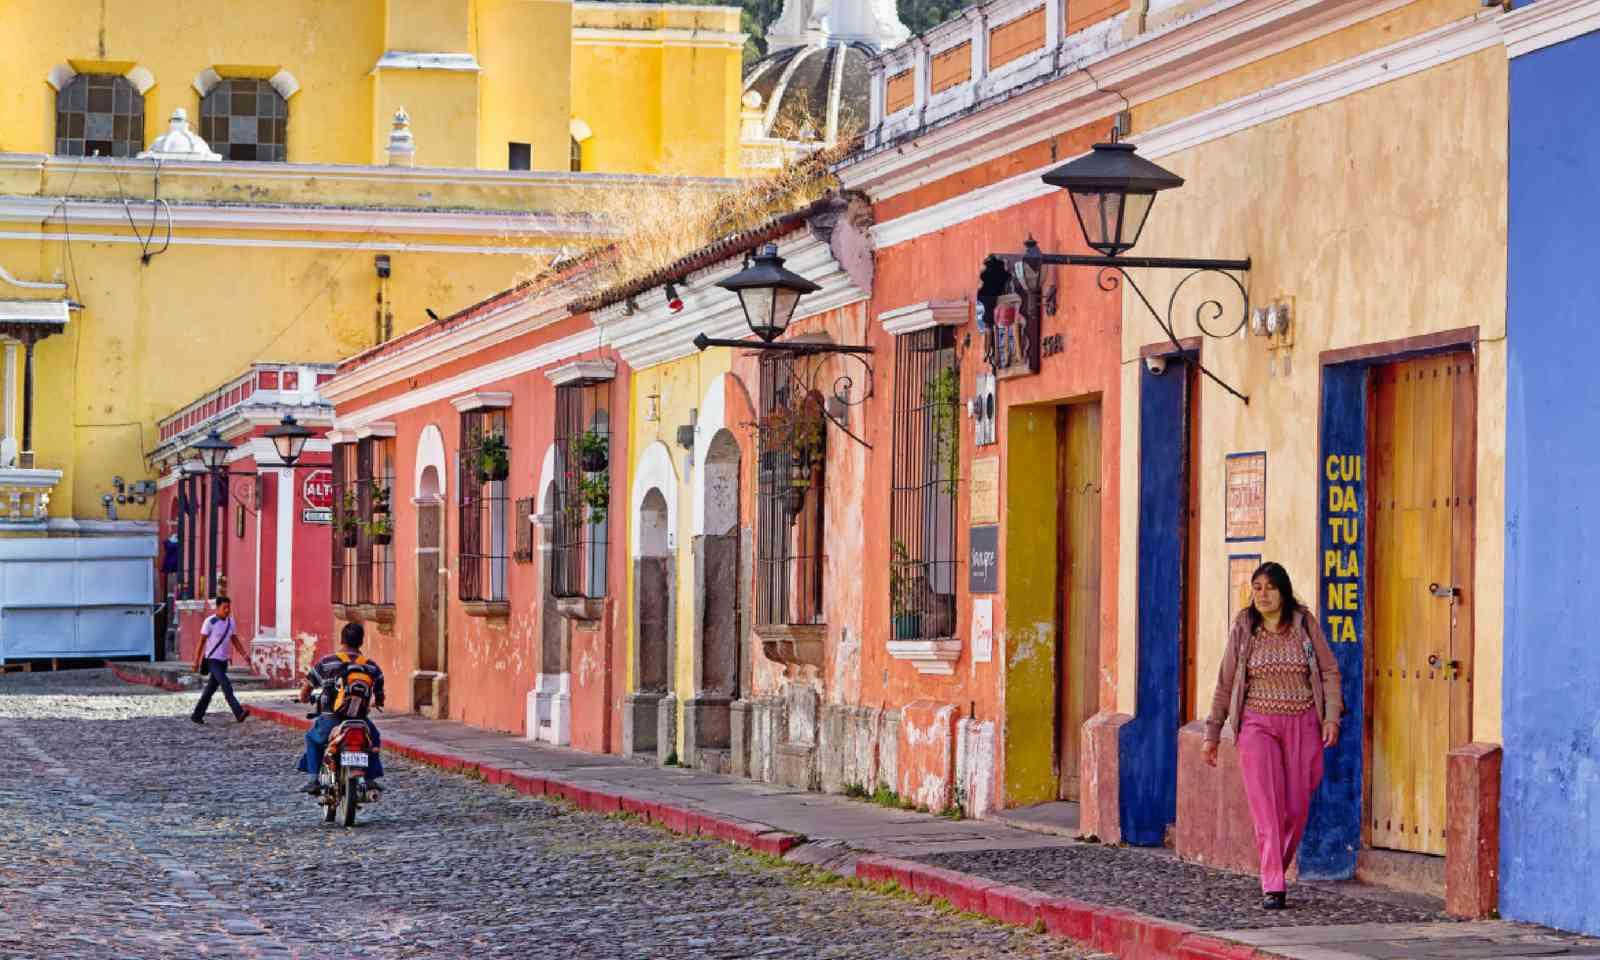 Antigua, Guatemala (Shutterstock)